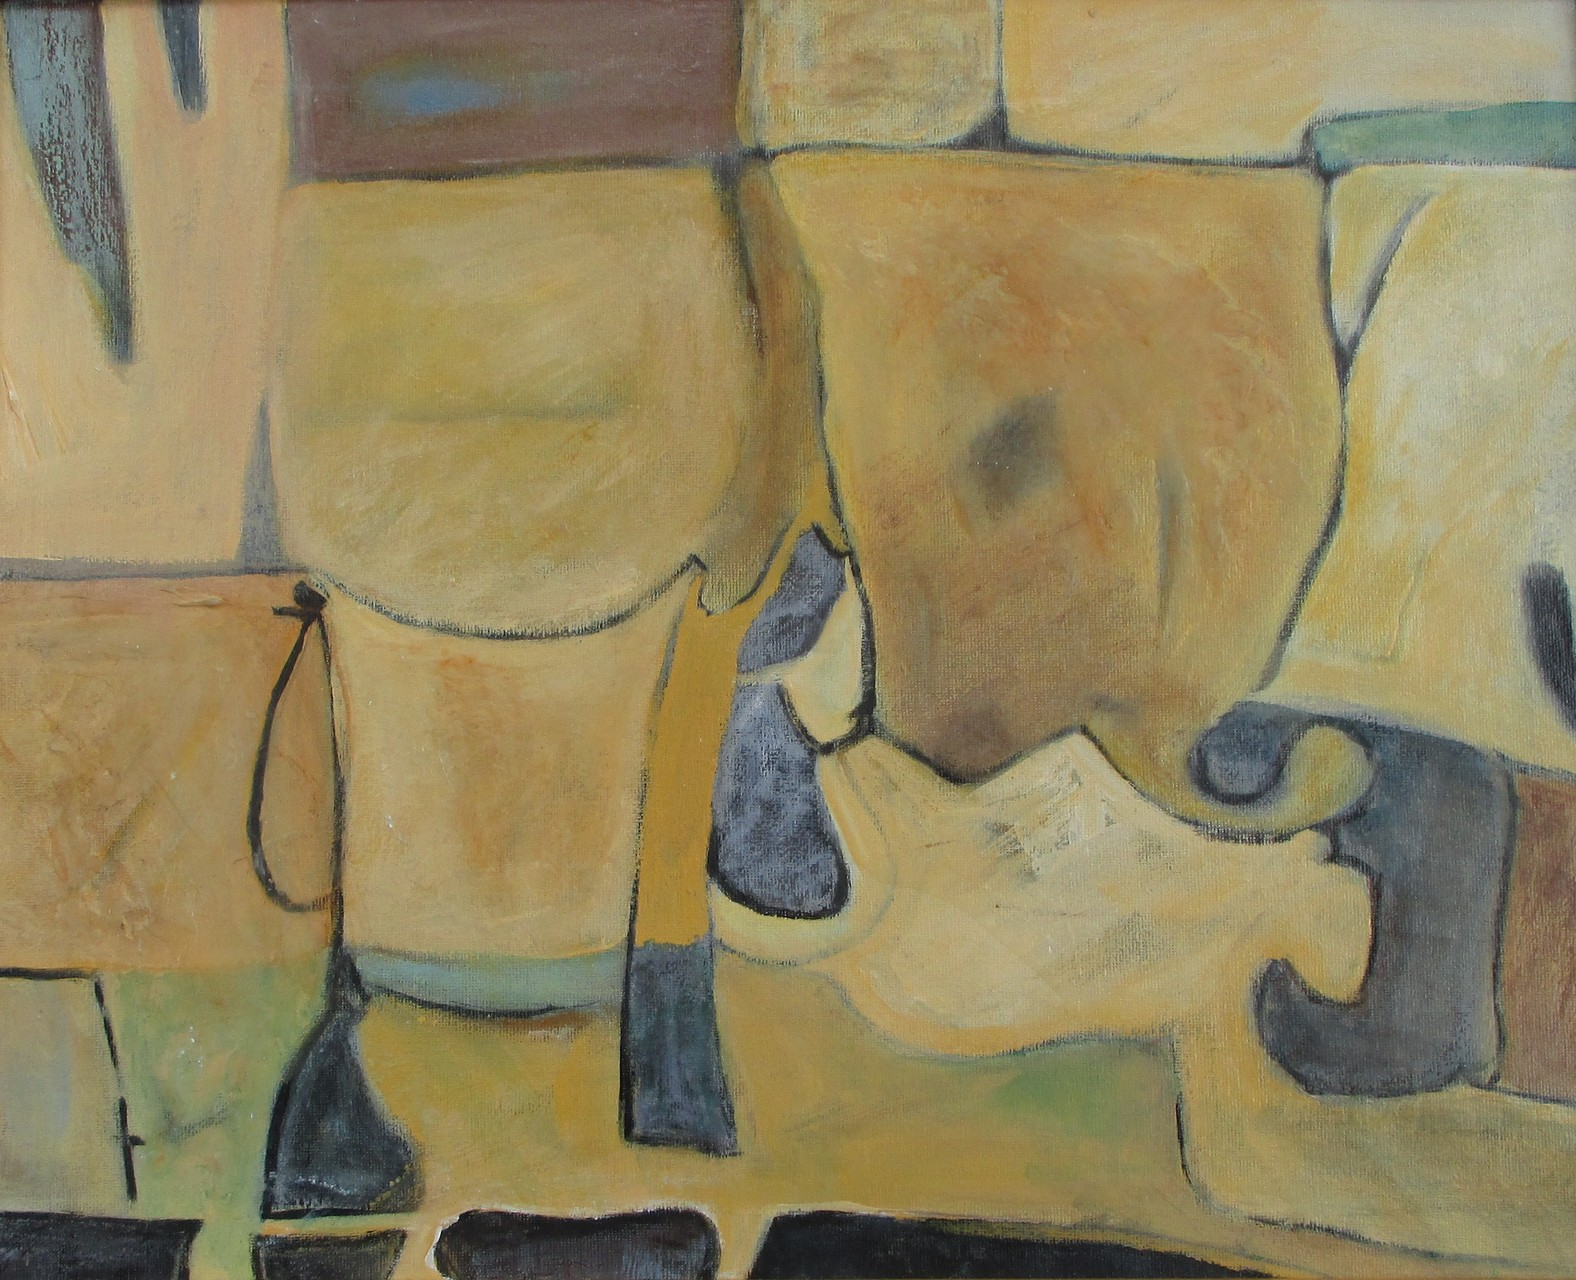 Madison, acrylic/encaustic on canvas, 20 x 16, 2015